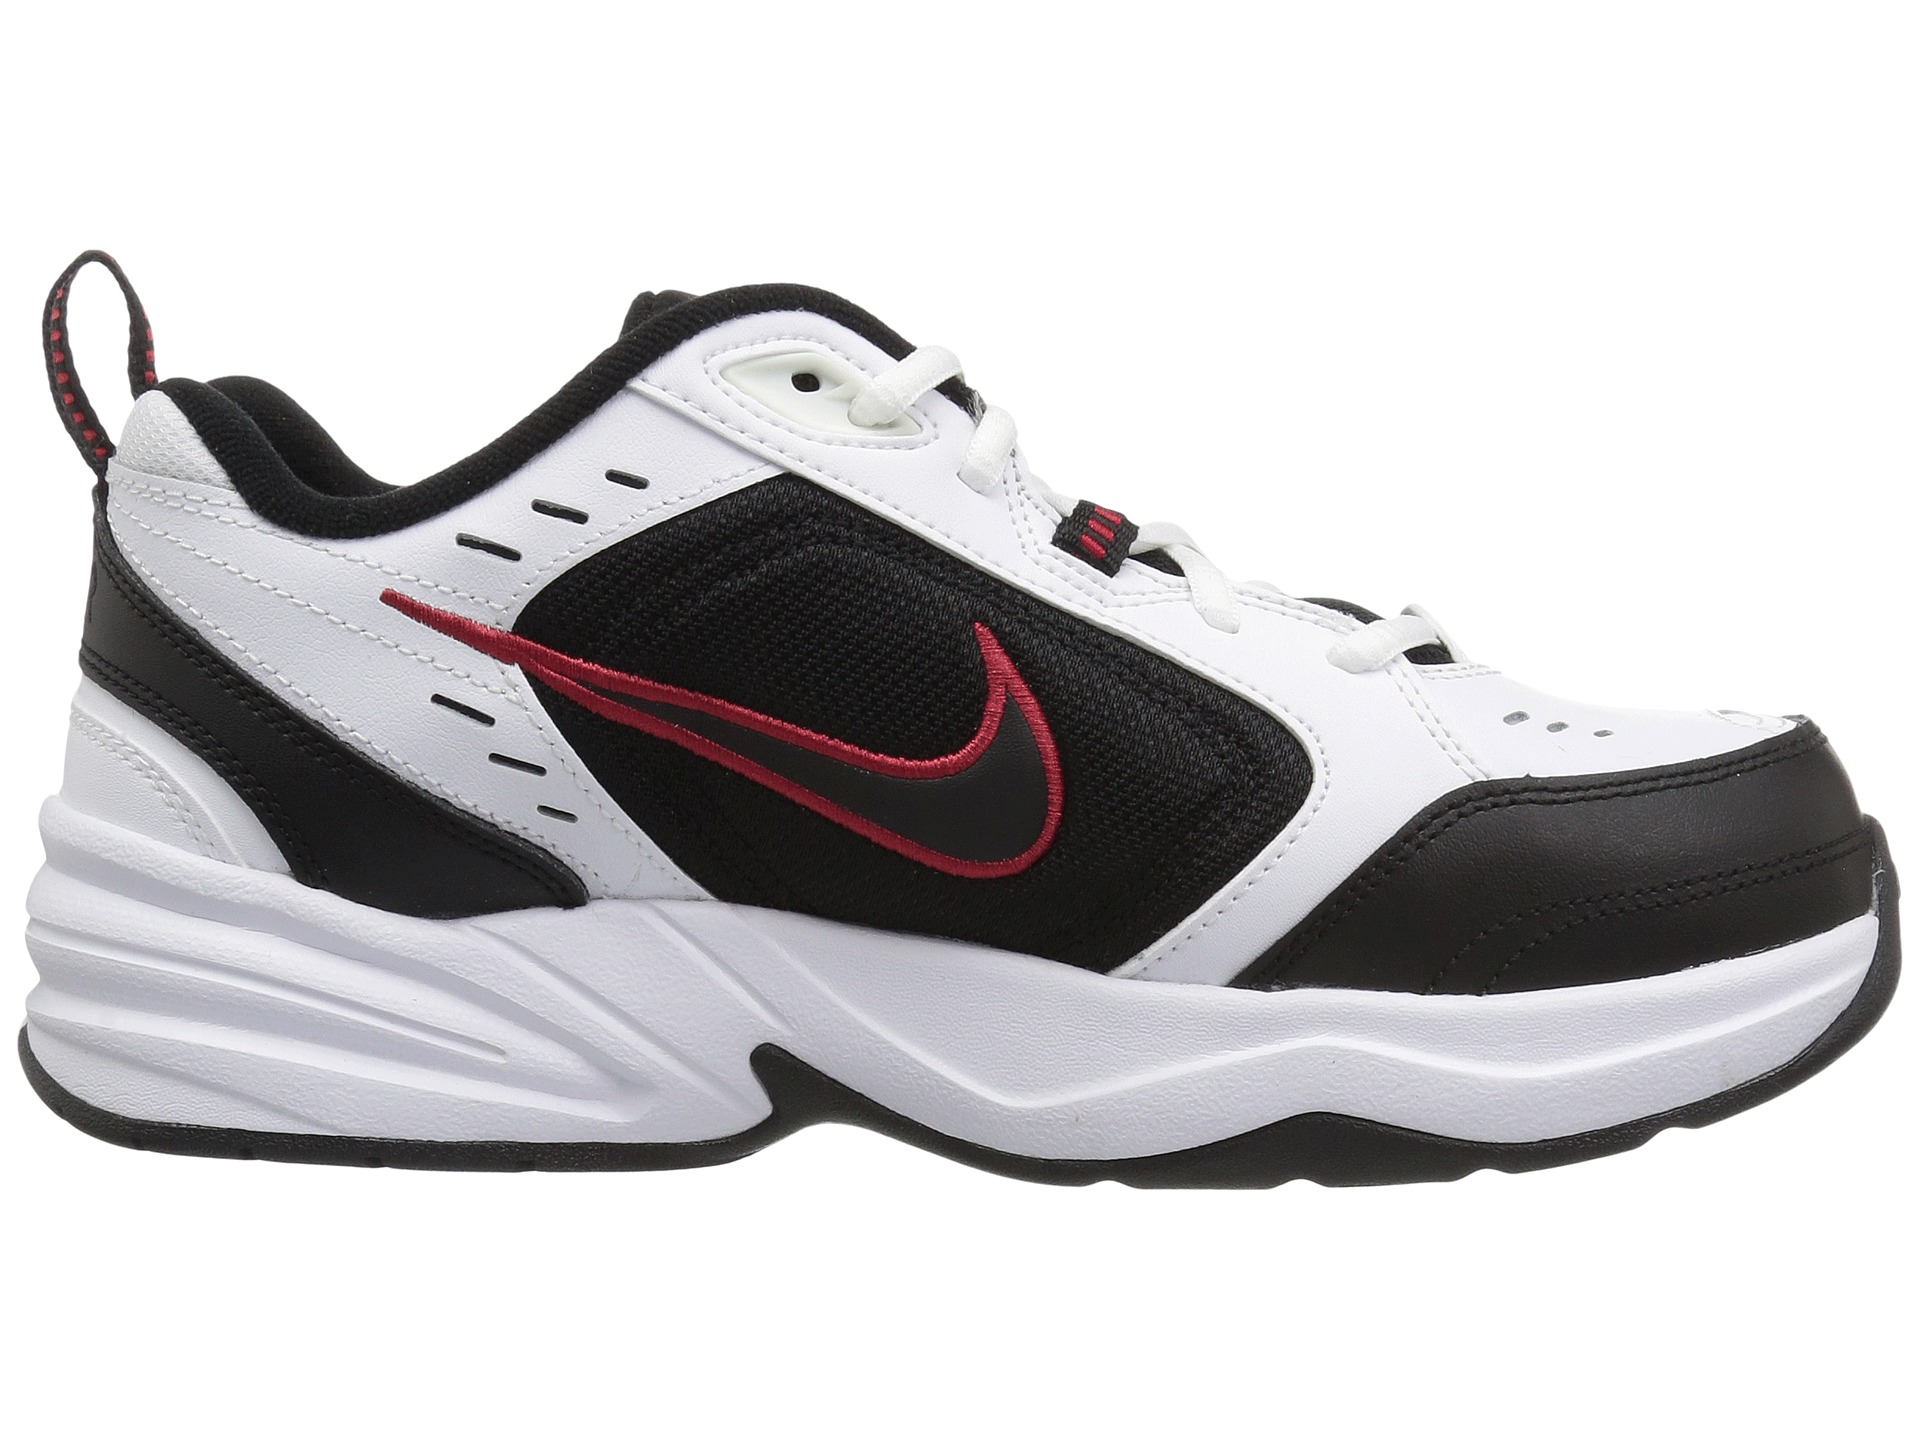 Nike Air Monarch IV White/Black-Varsity Red - Zappos.com ...